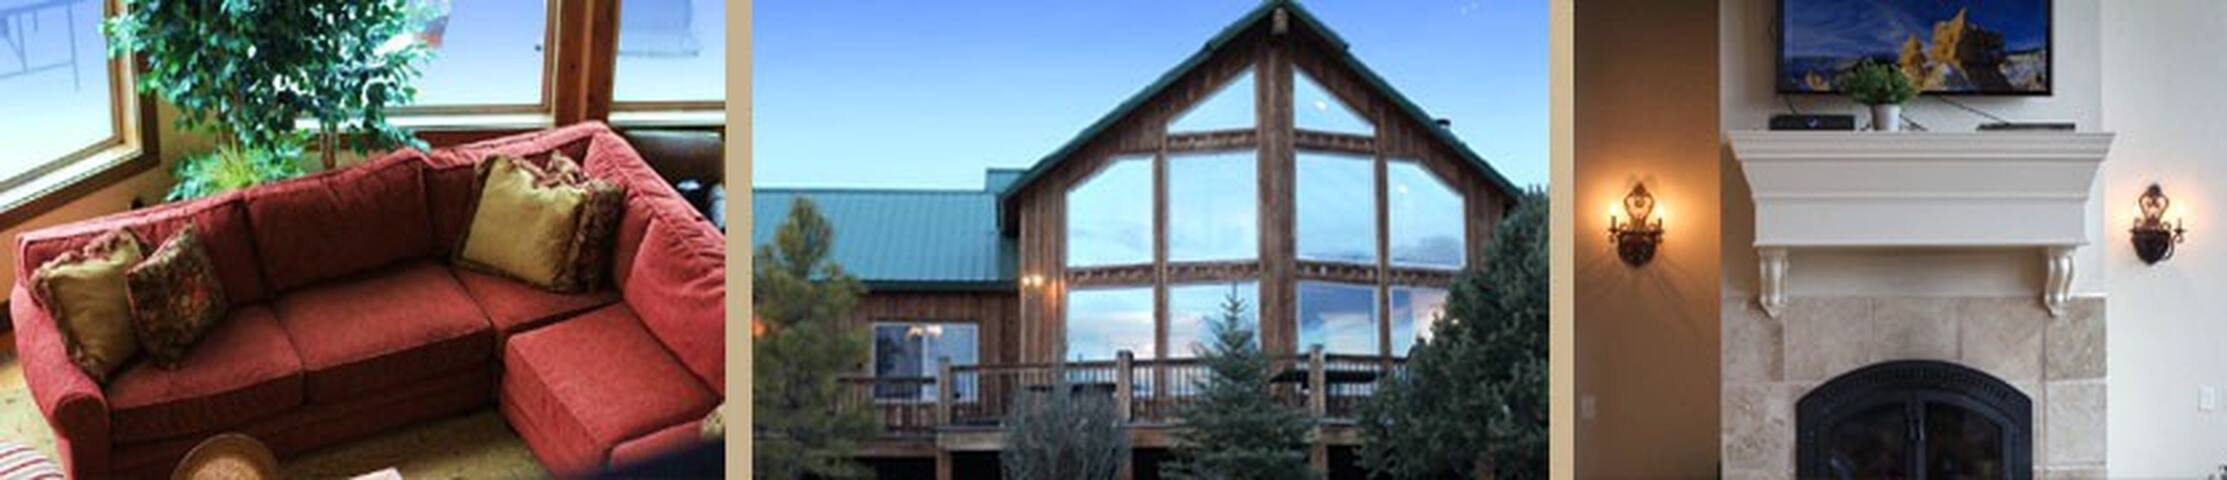 Luxurious cabin near Zion National Park sleeps 22